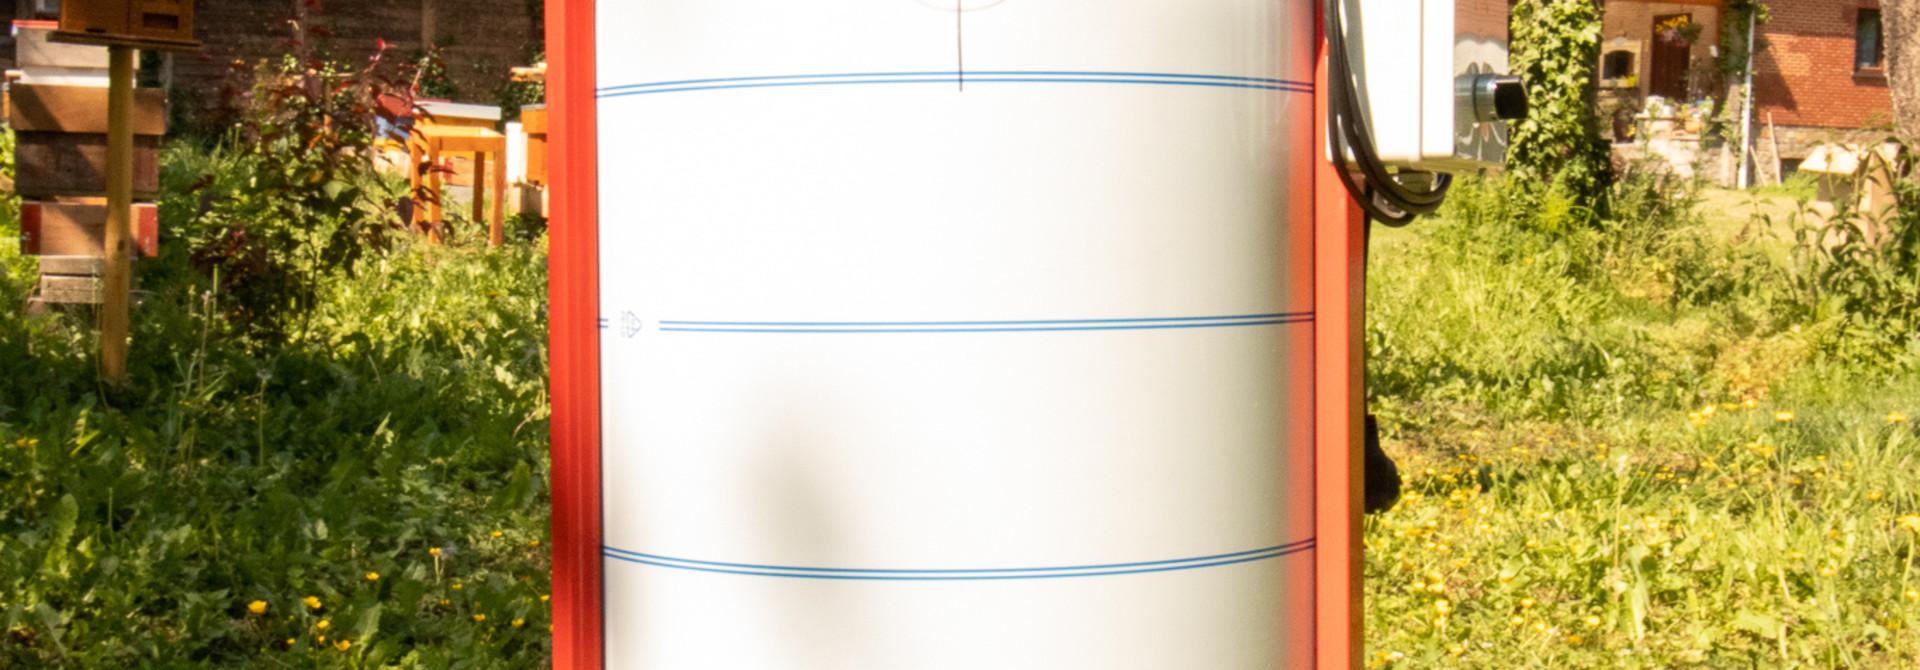 Apini - Elektrische 4 raams honingslinger ø500mm